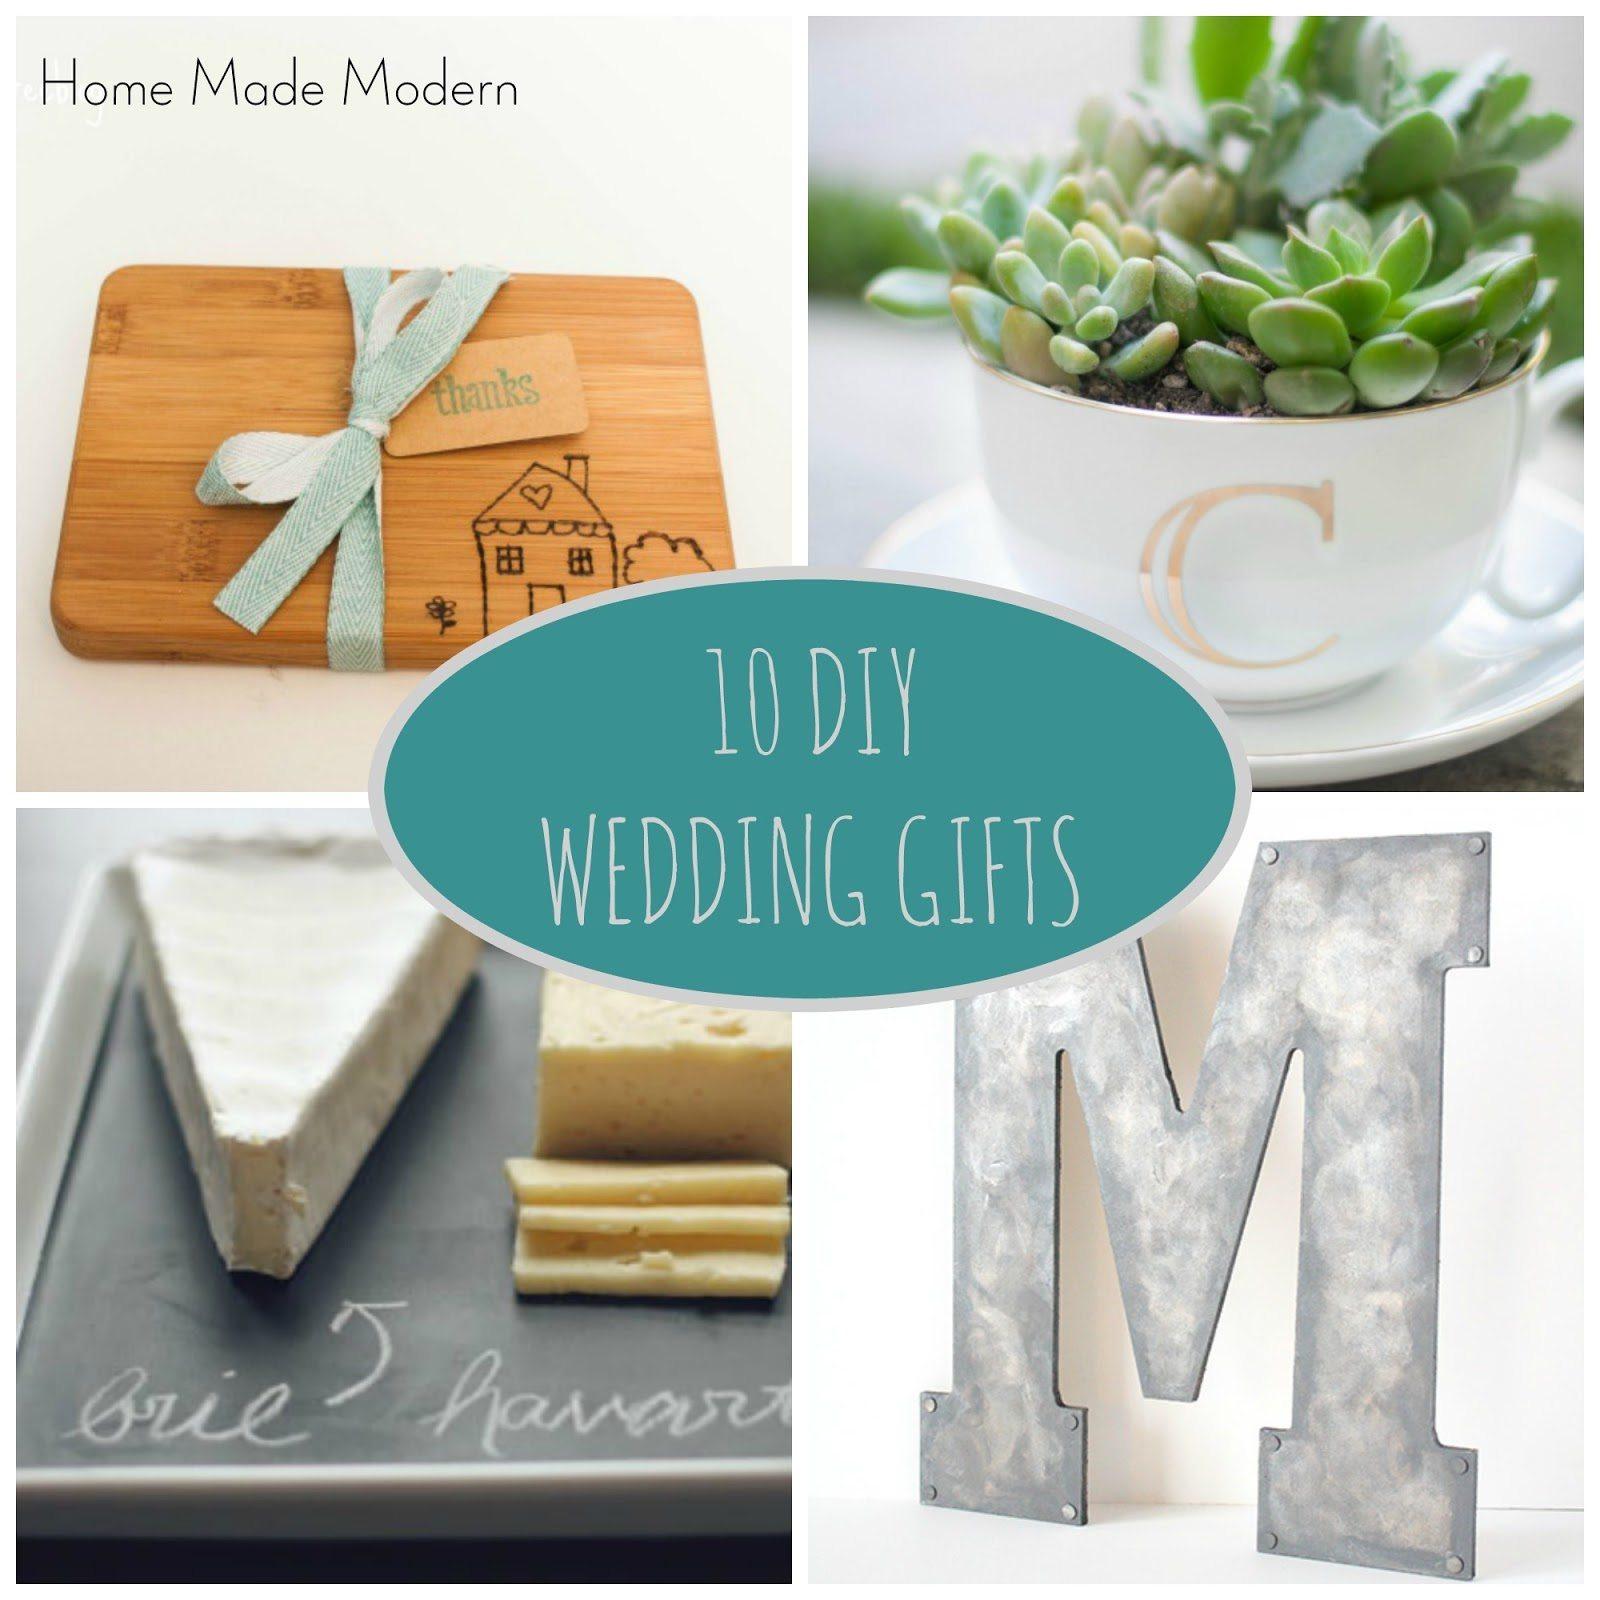 Homemade Wedding Gifts  DIY Wedding Gifts Home Made Modern